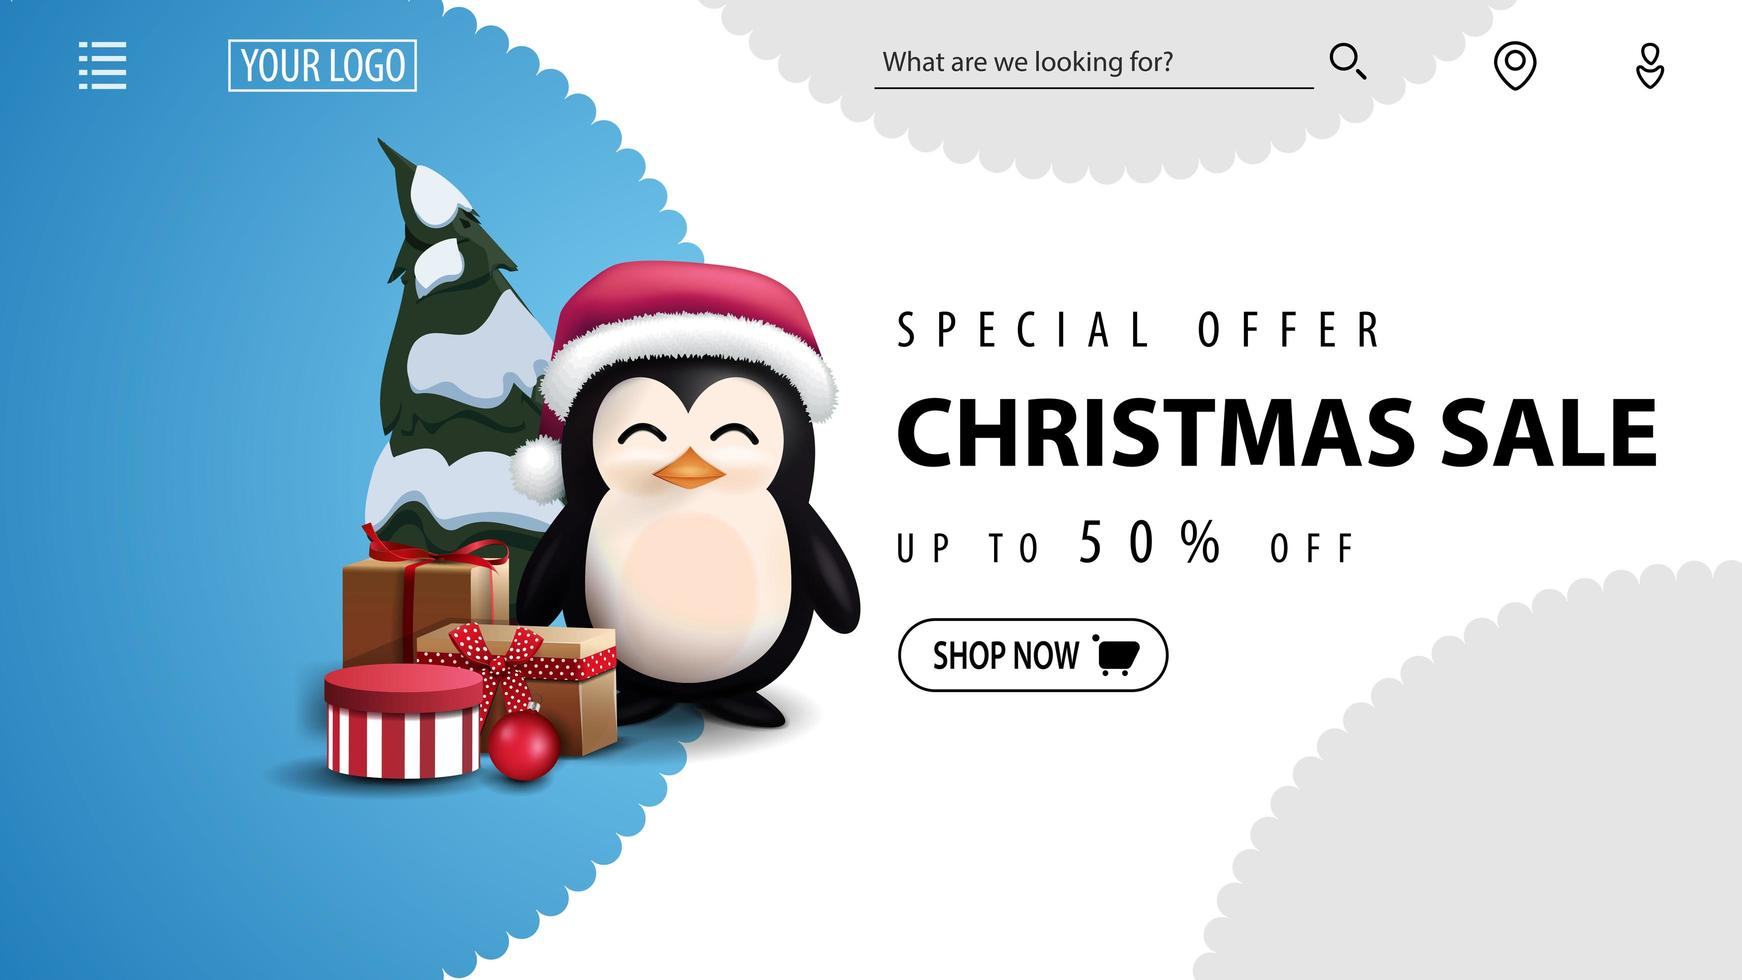 speciale aanbieding, kerstuitverkoop, tot 50 korting, blauwe en witte kortingsbanner voor website met pinguïn in kerstmanhoed met cadeautjes vector